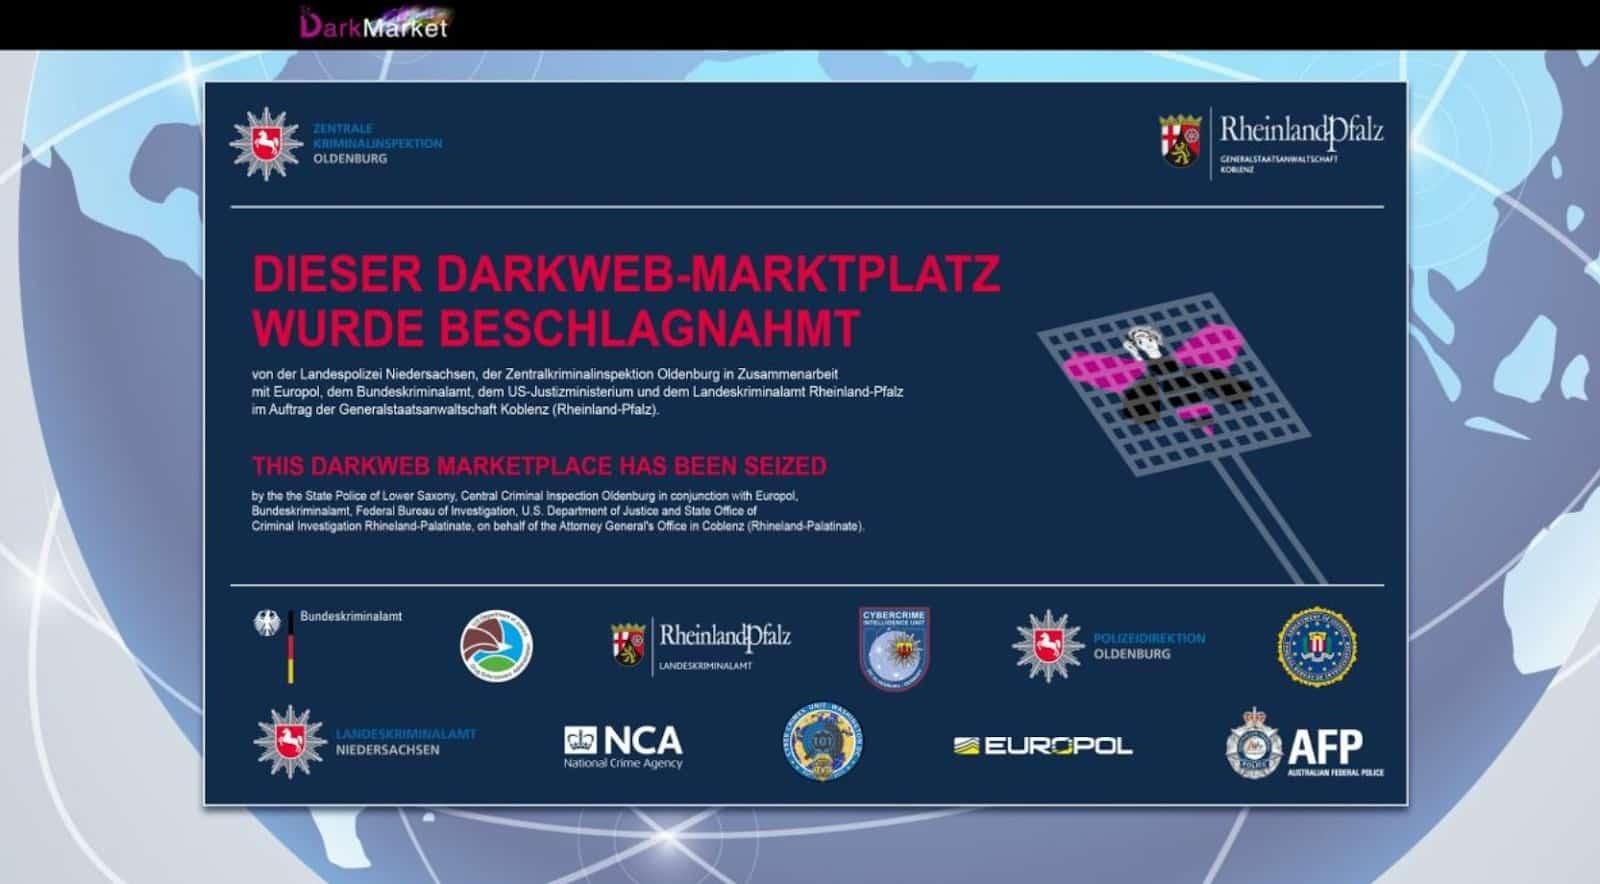 Figure 1. Notice of seizure on cybercriminal marketplace DarkMarket